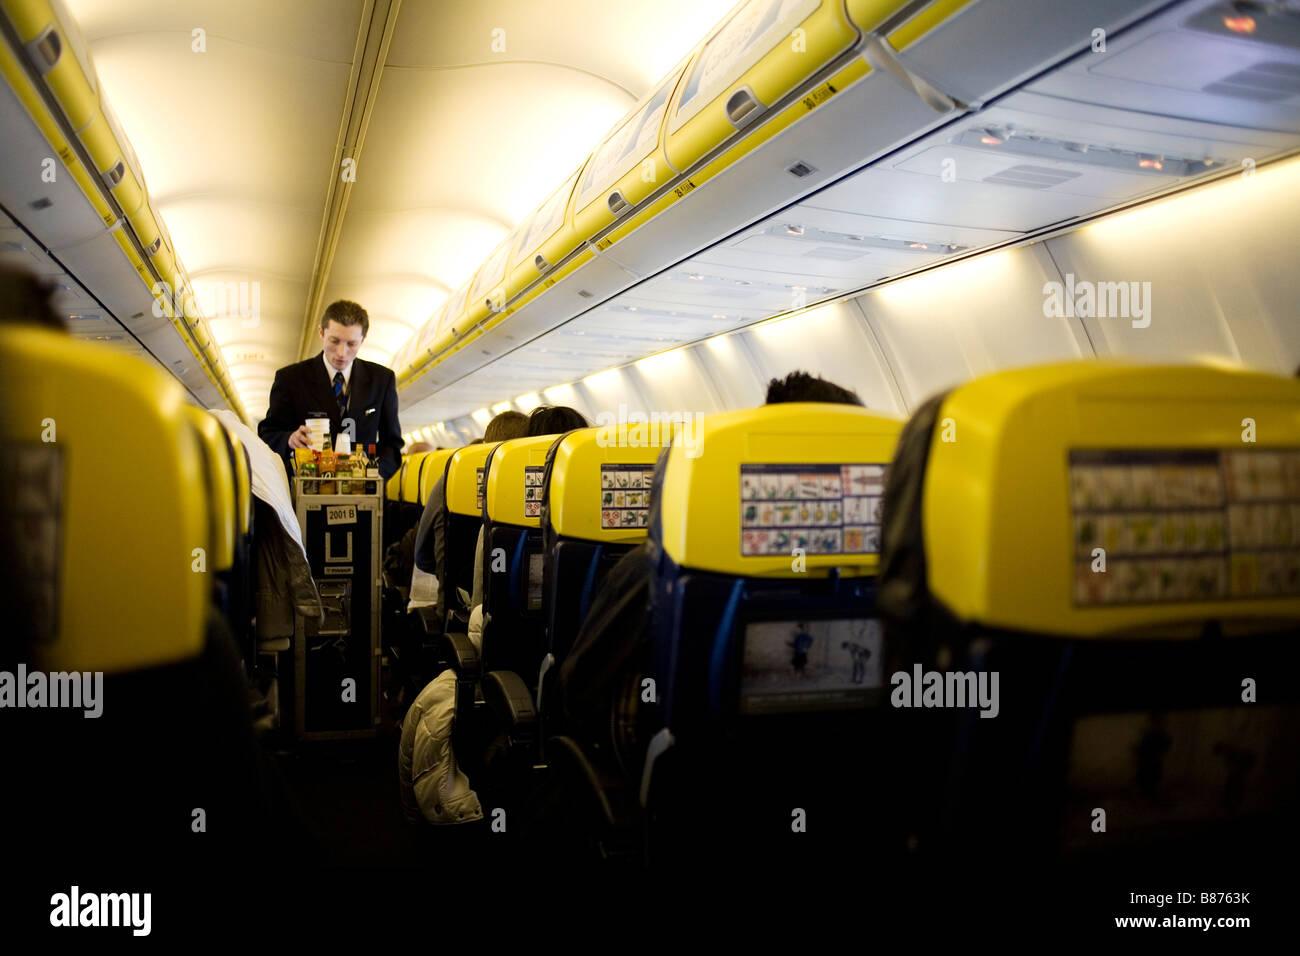 Service on a Ryanair flight. - Stock Image